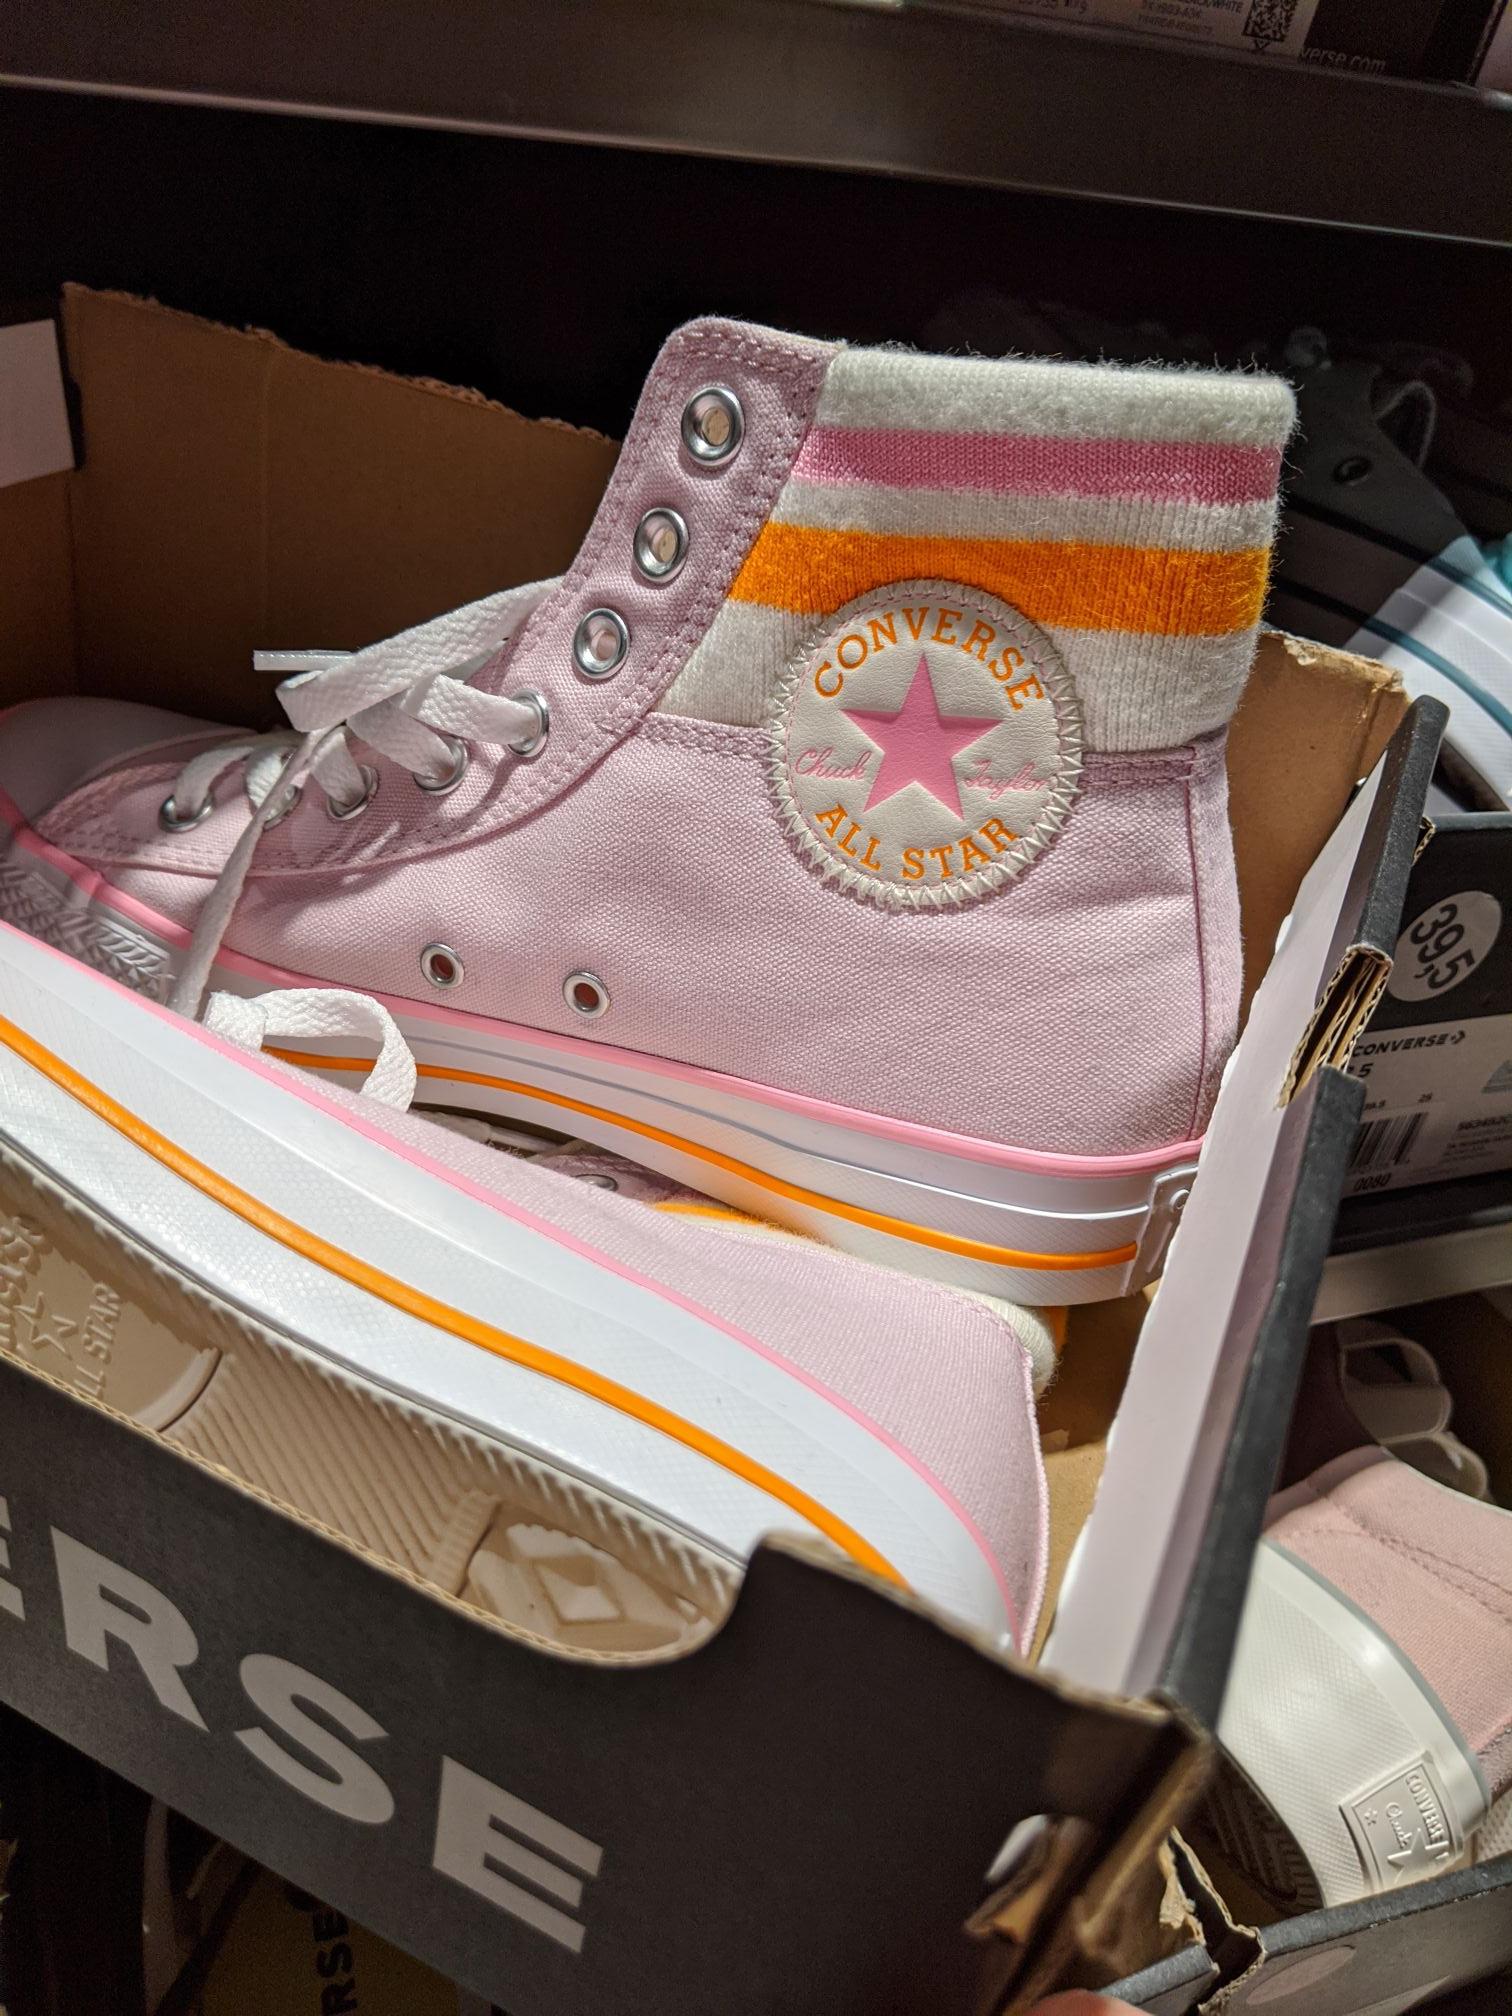 Chaussures Converse One Star Academy (Marque Avenue Corbeil